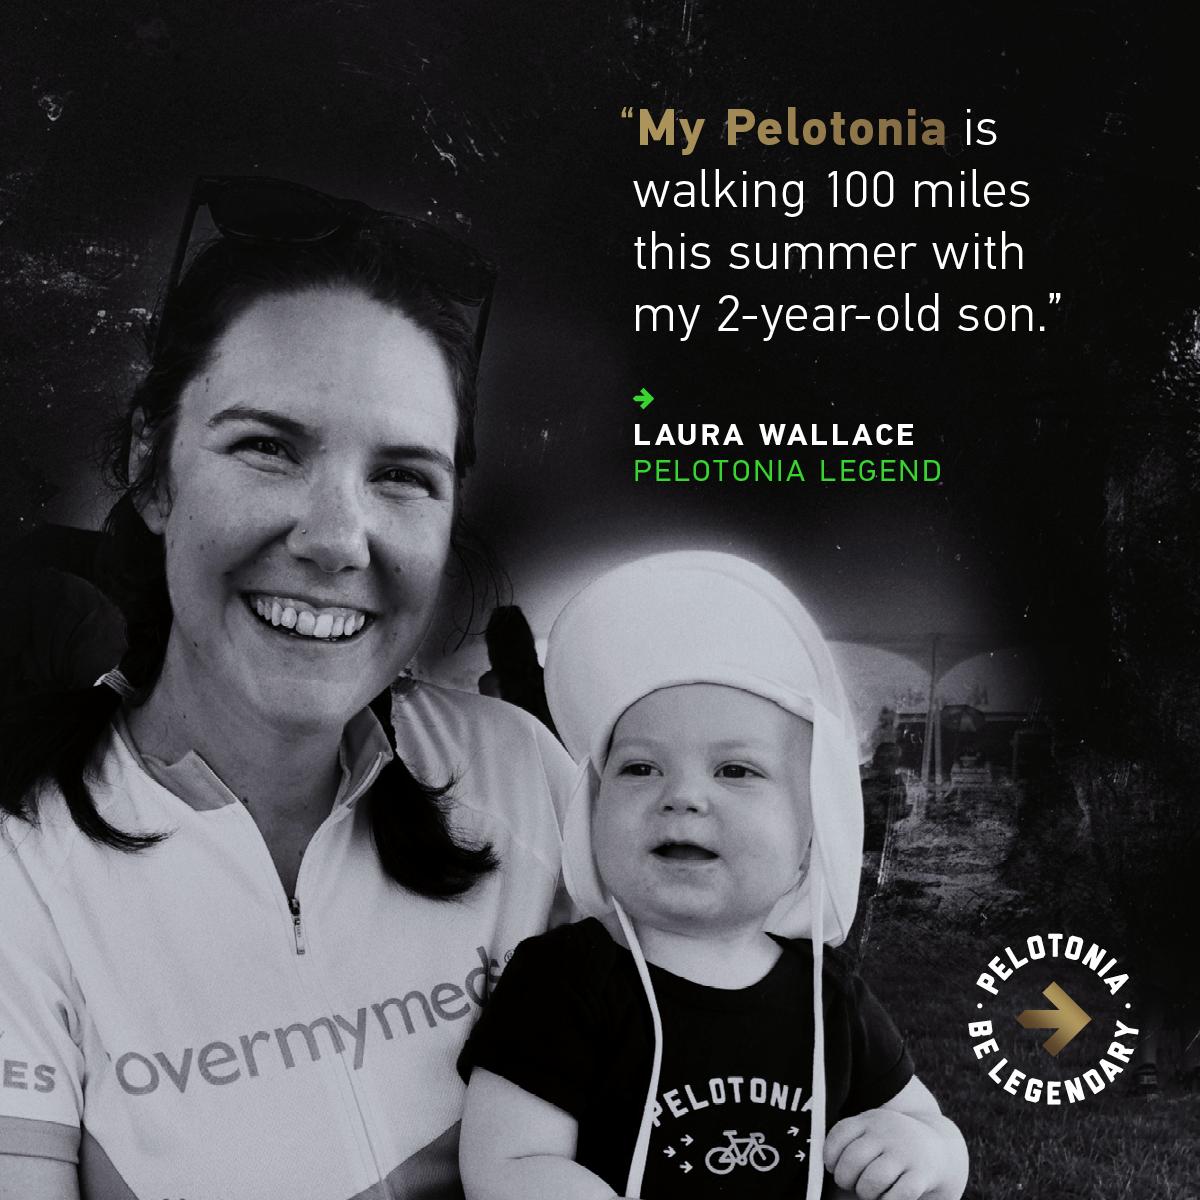 Laura Wallace Pelotonia Legend Testimonial